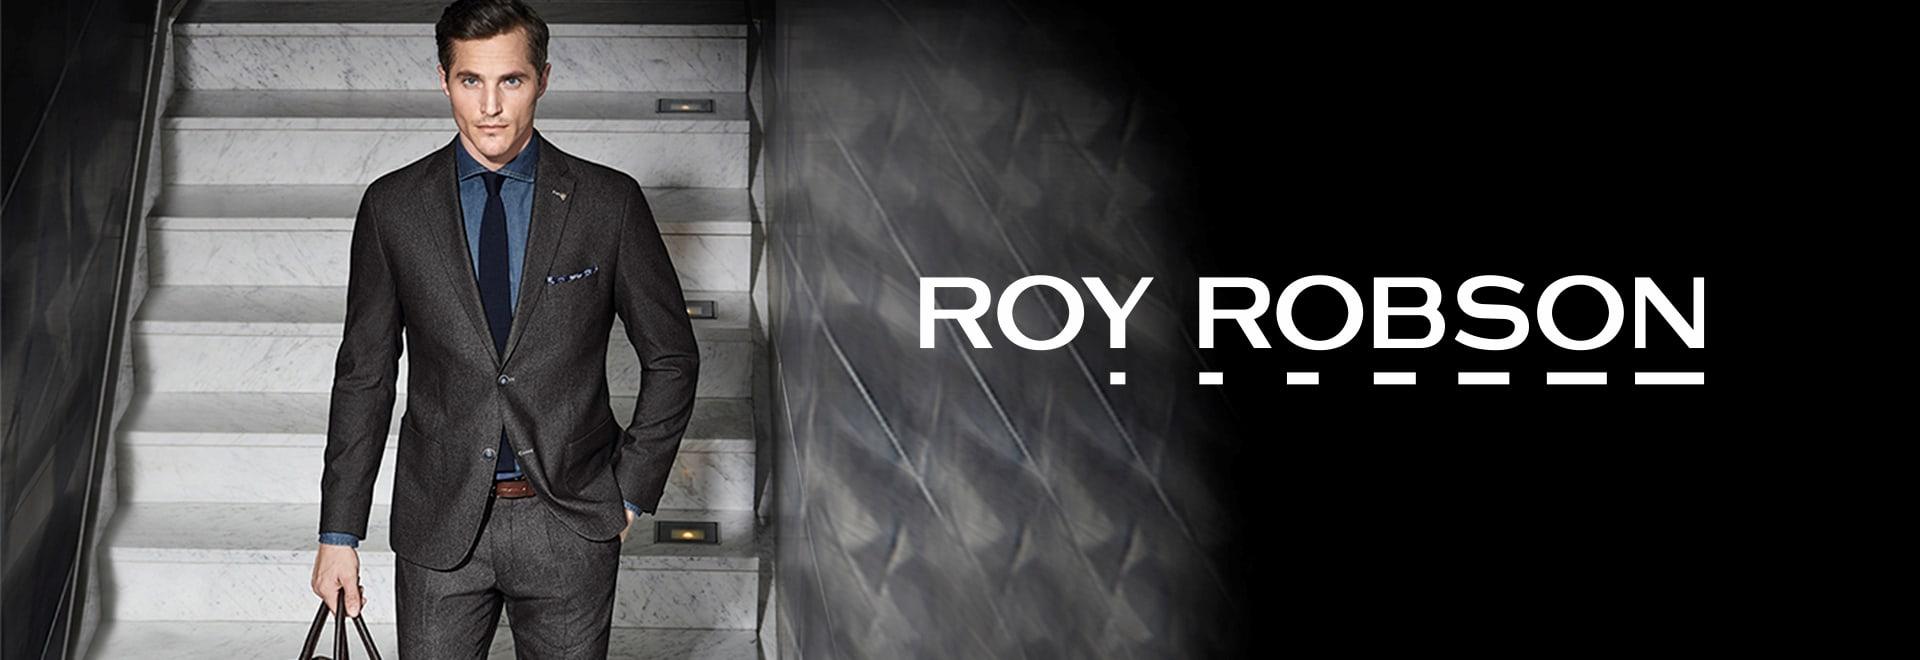 ROY ROBSON FASHION international brand soon at Blockbuster Mall